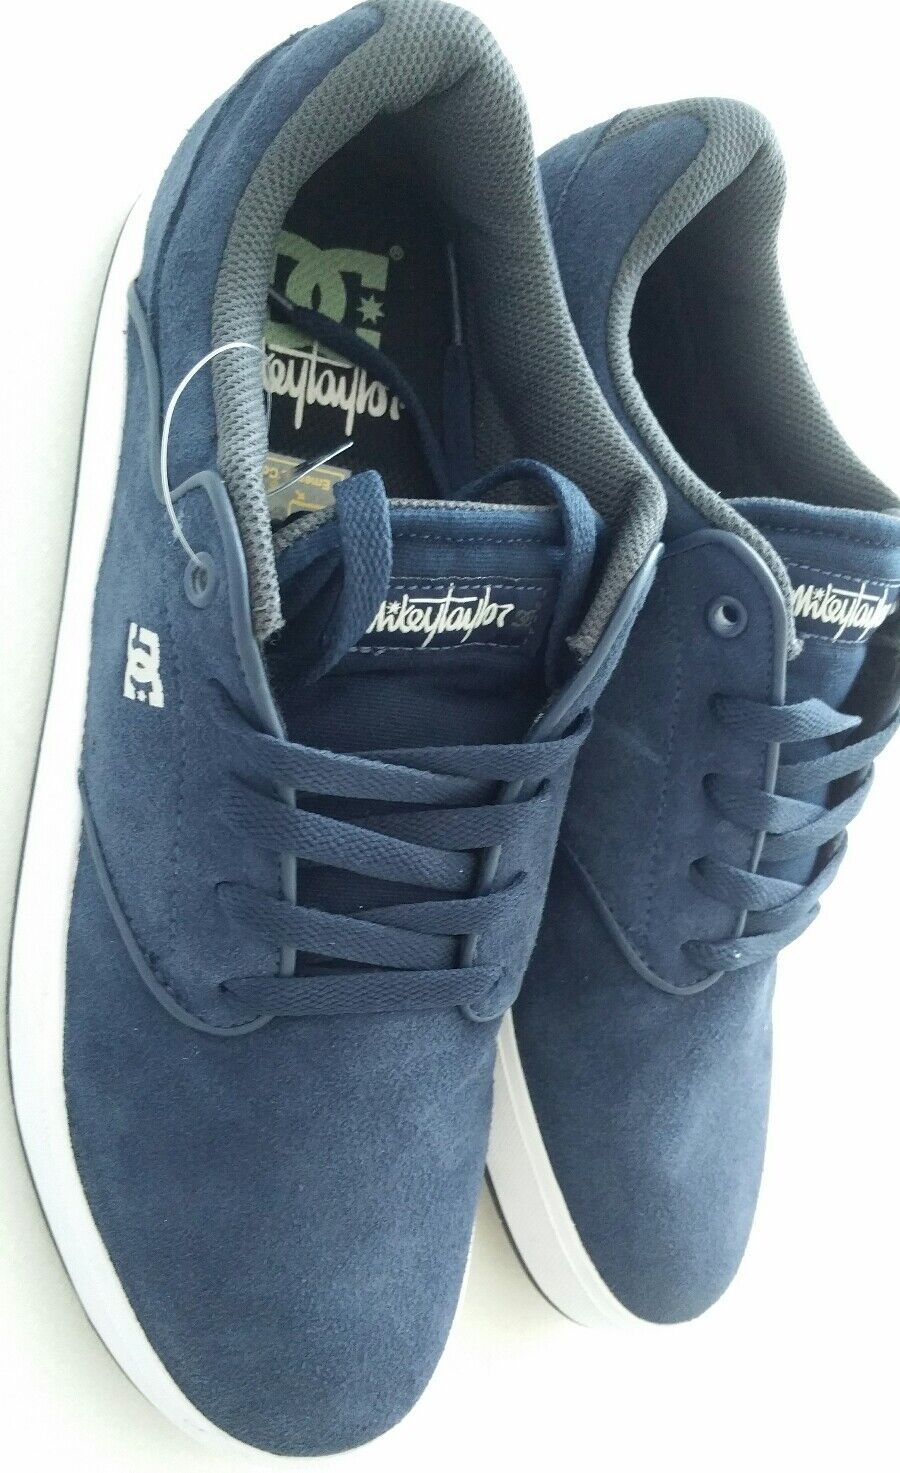 DC Shoes NEU Trend Sneaker Wildleder Herren Marken Sneaker Mike Taylor Loh Top